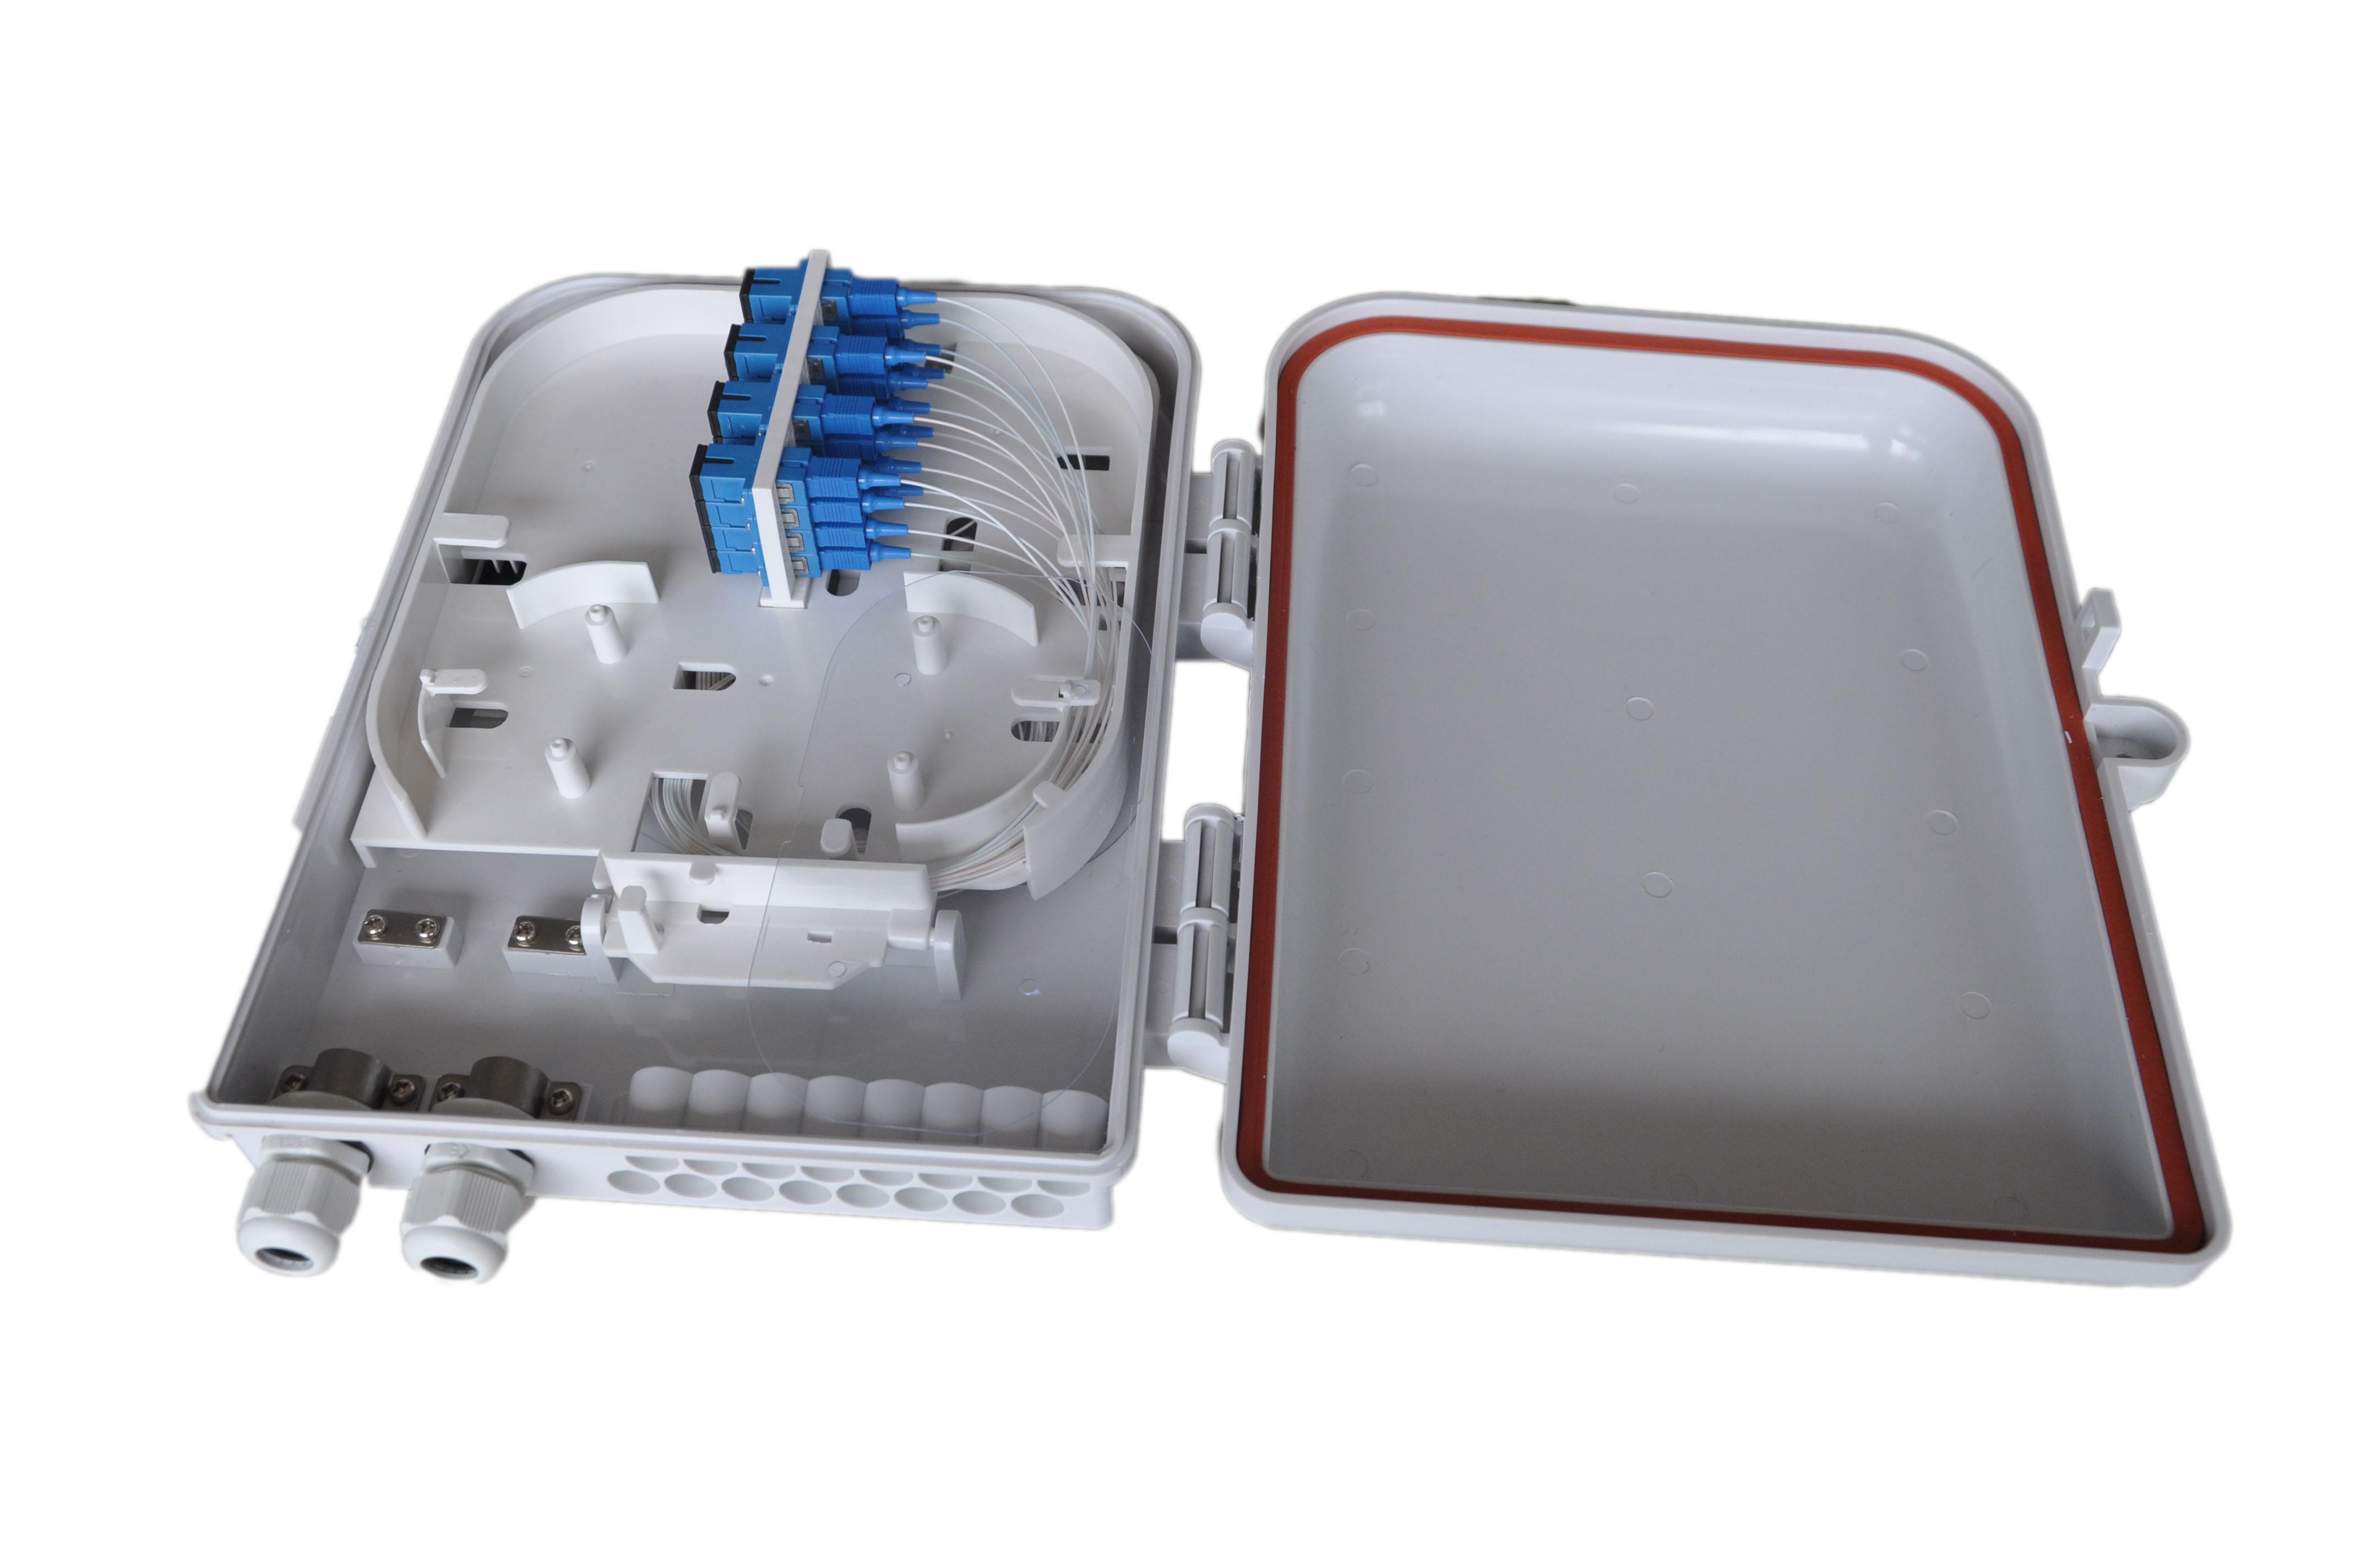 16 cores fiber termination box, FTTH box,